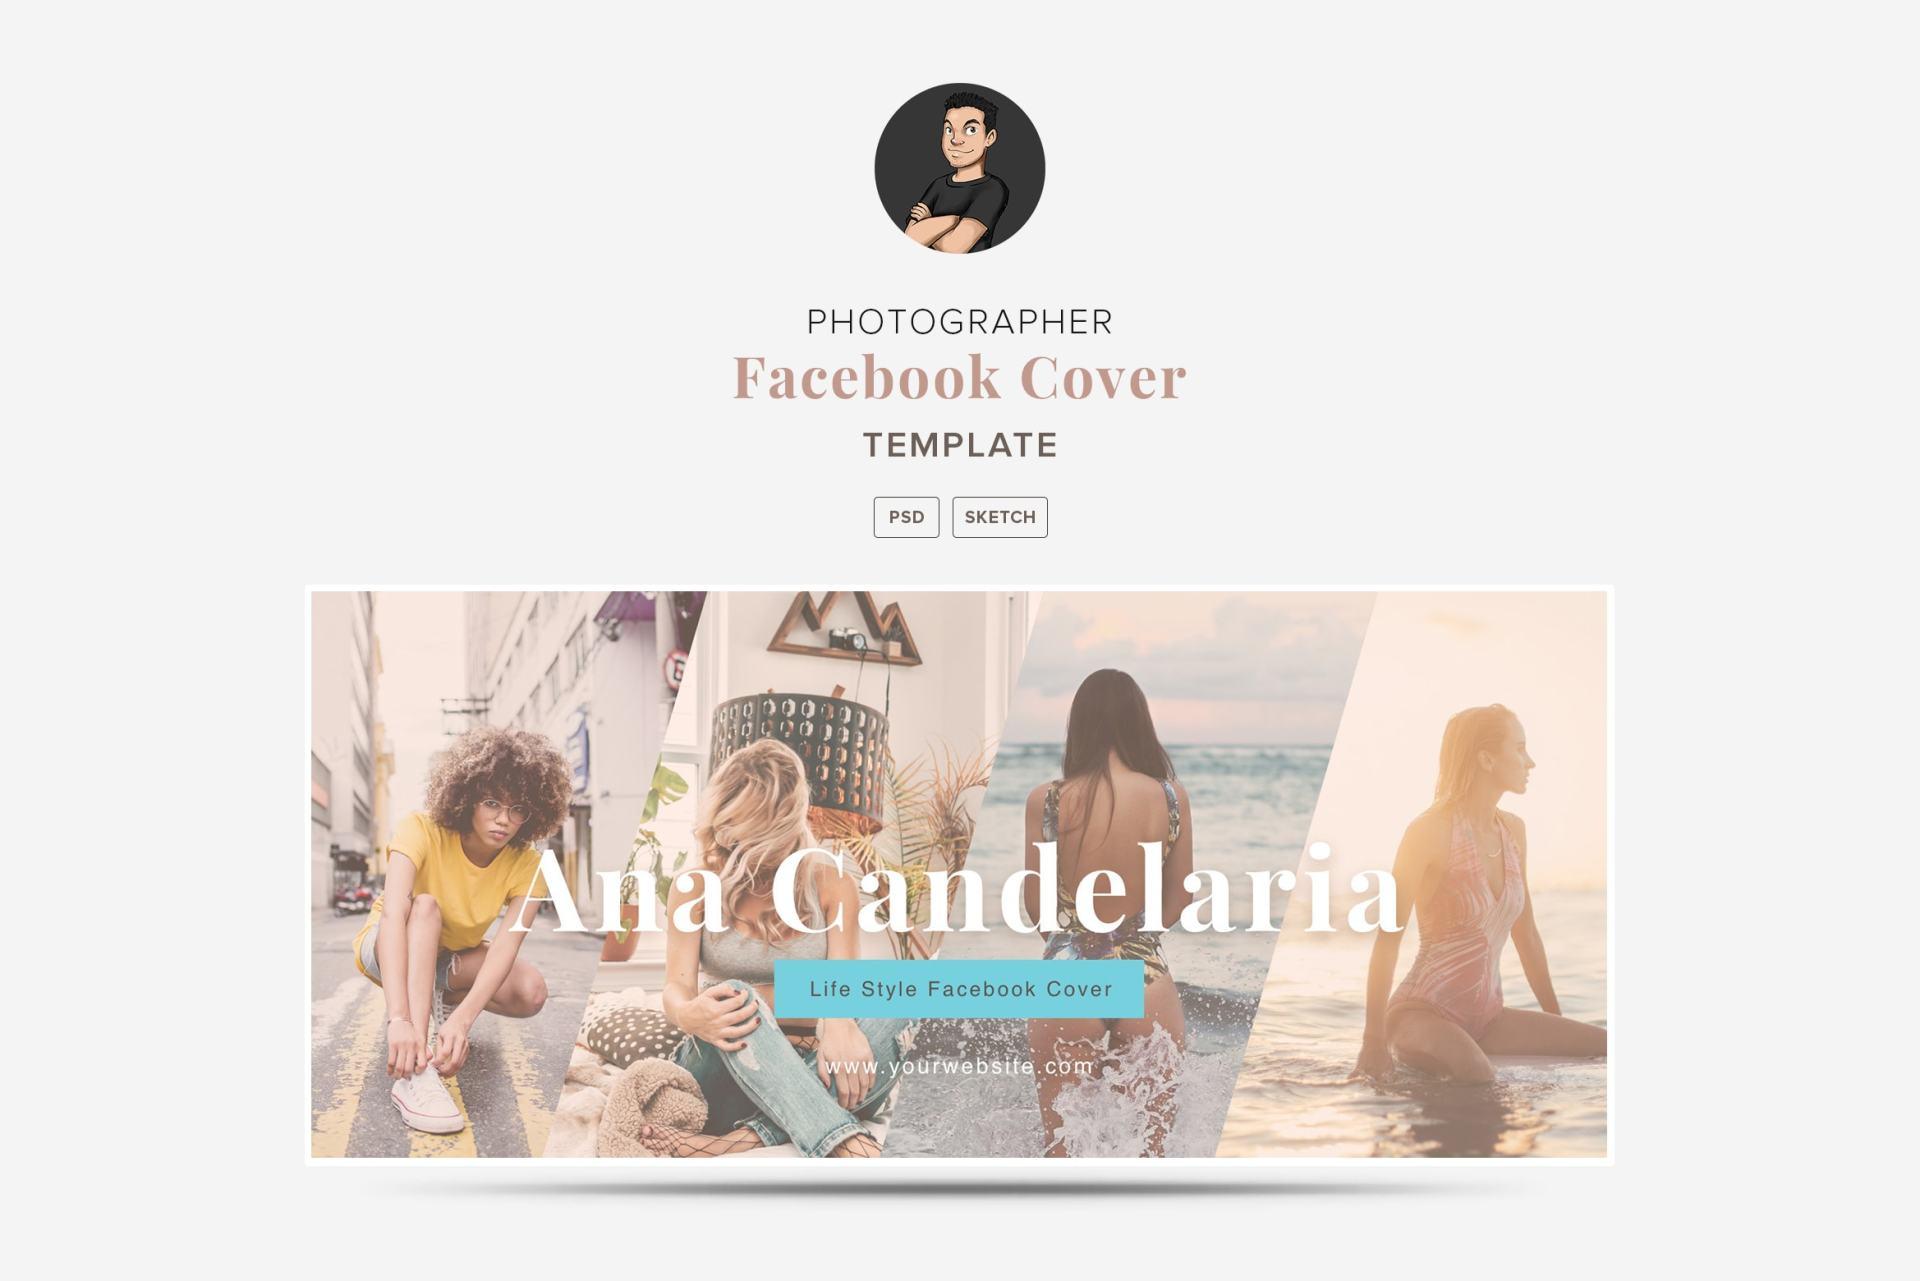 Facebook Cover Template